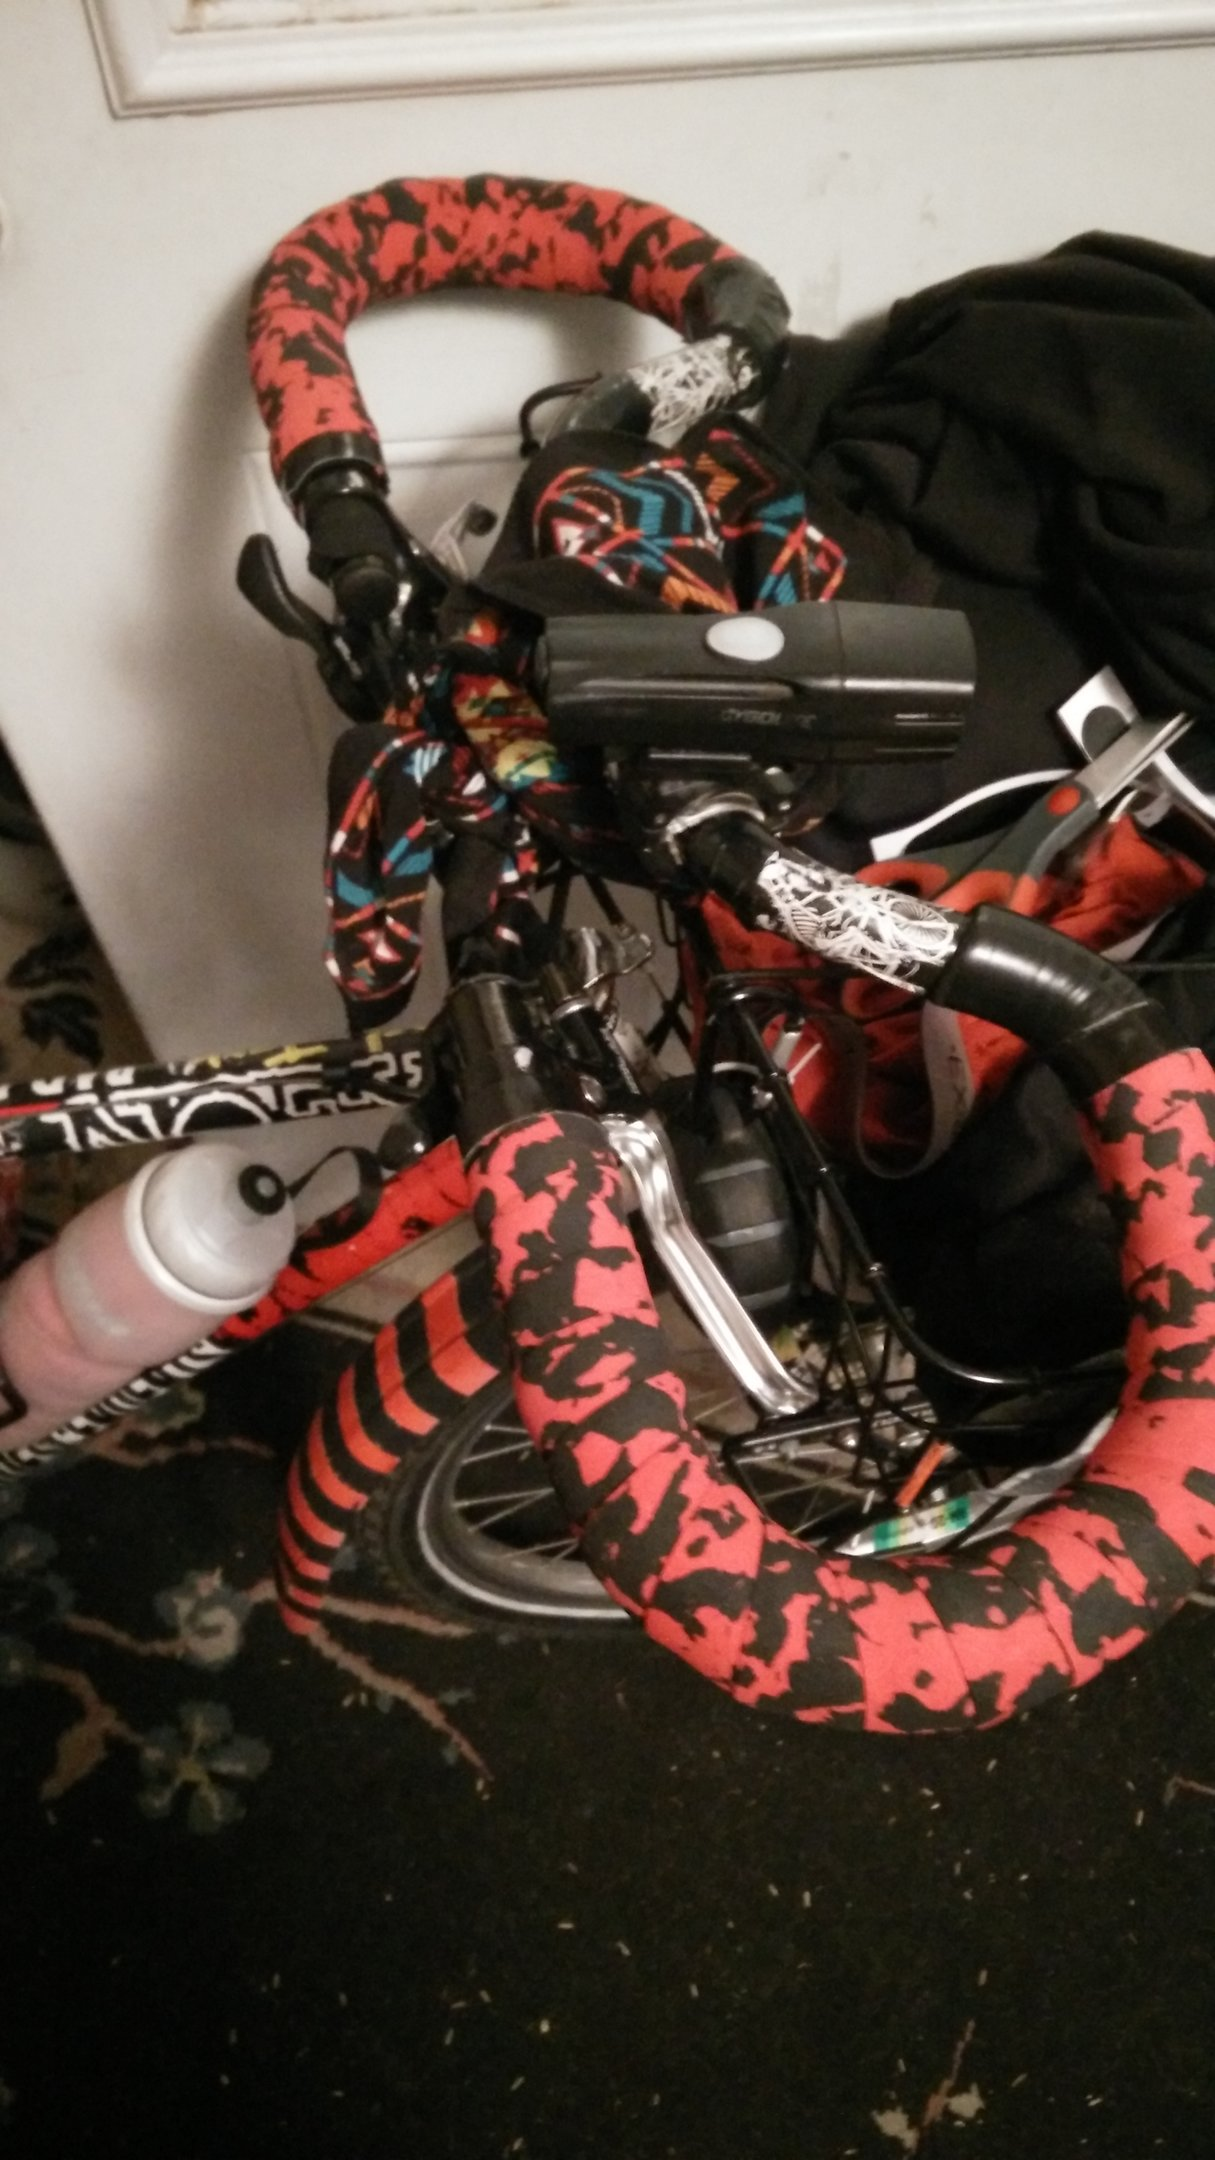 img_20190203_180423-jpg.48887_FIRST EVER BIKE TOUR (PICS)_Bike Touring_Squat the Planet_2:28 PM